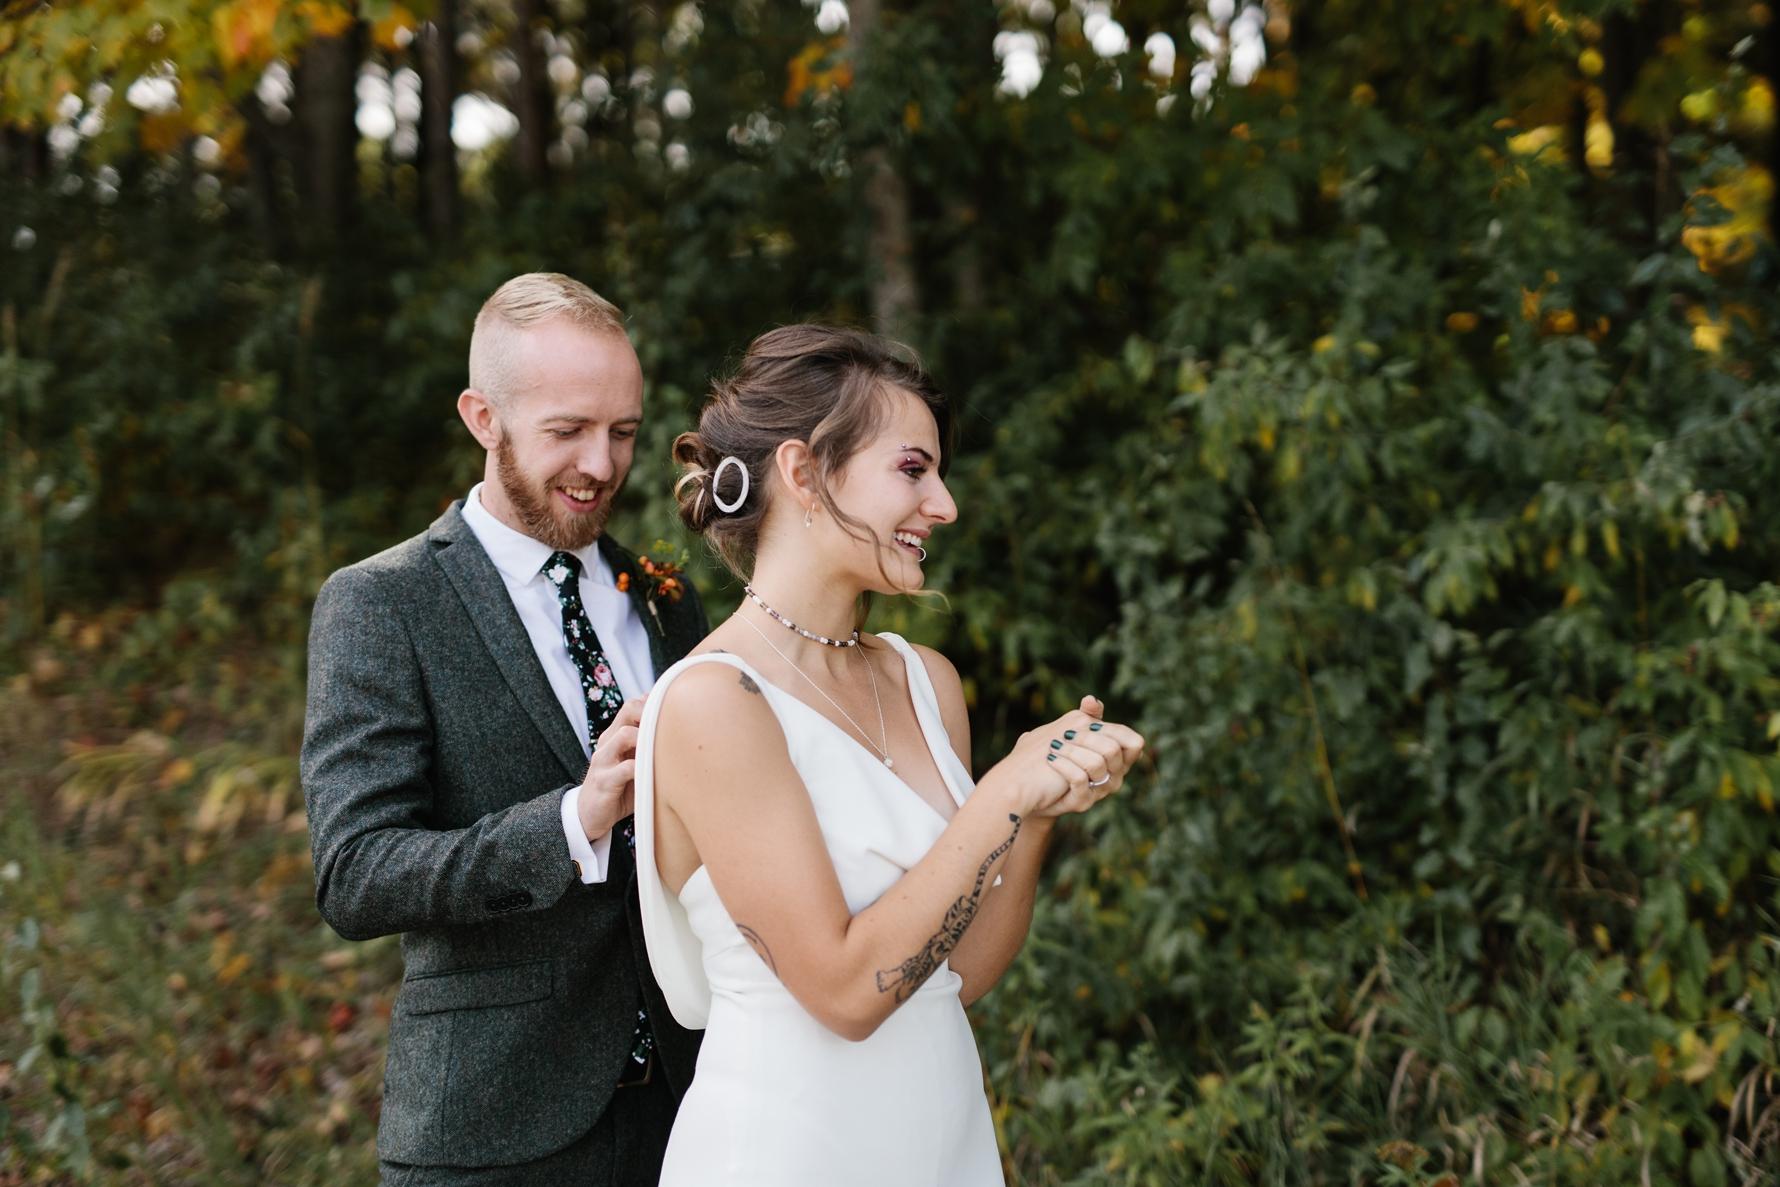 norris-traverse-city-wedding-18.JPG